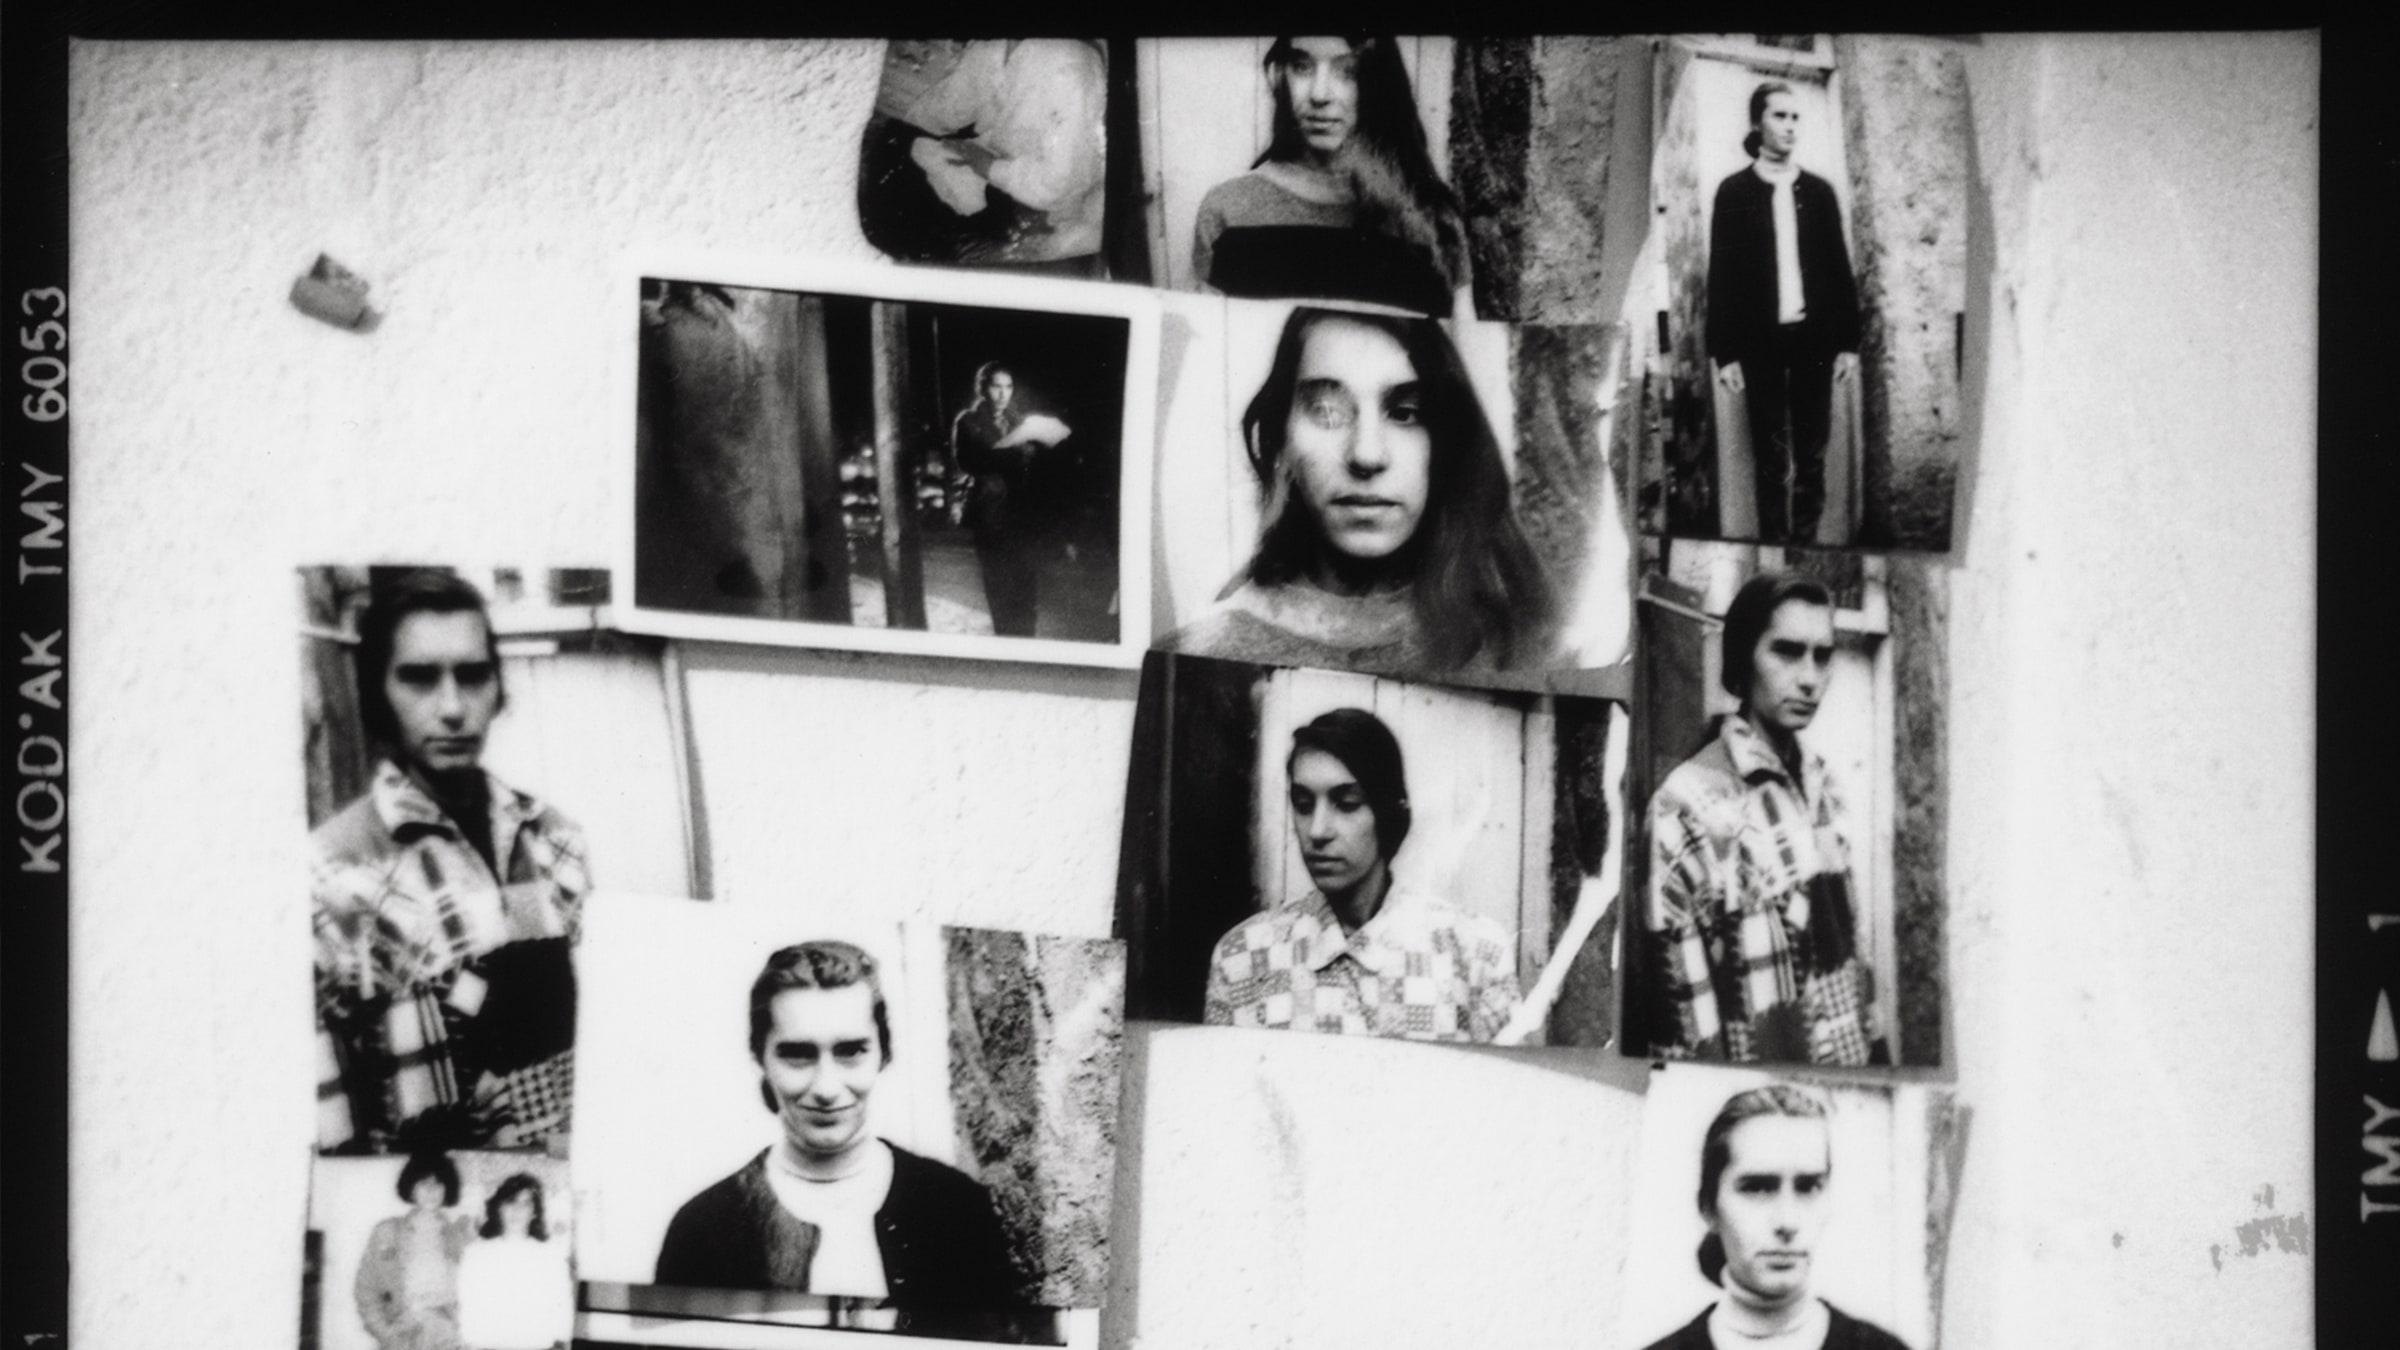 iyi bir komşu<br>36. İstanbul Film Festivali